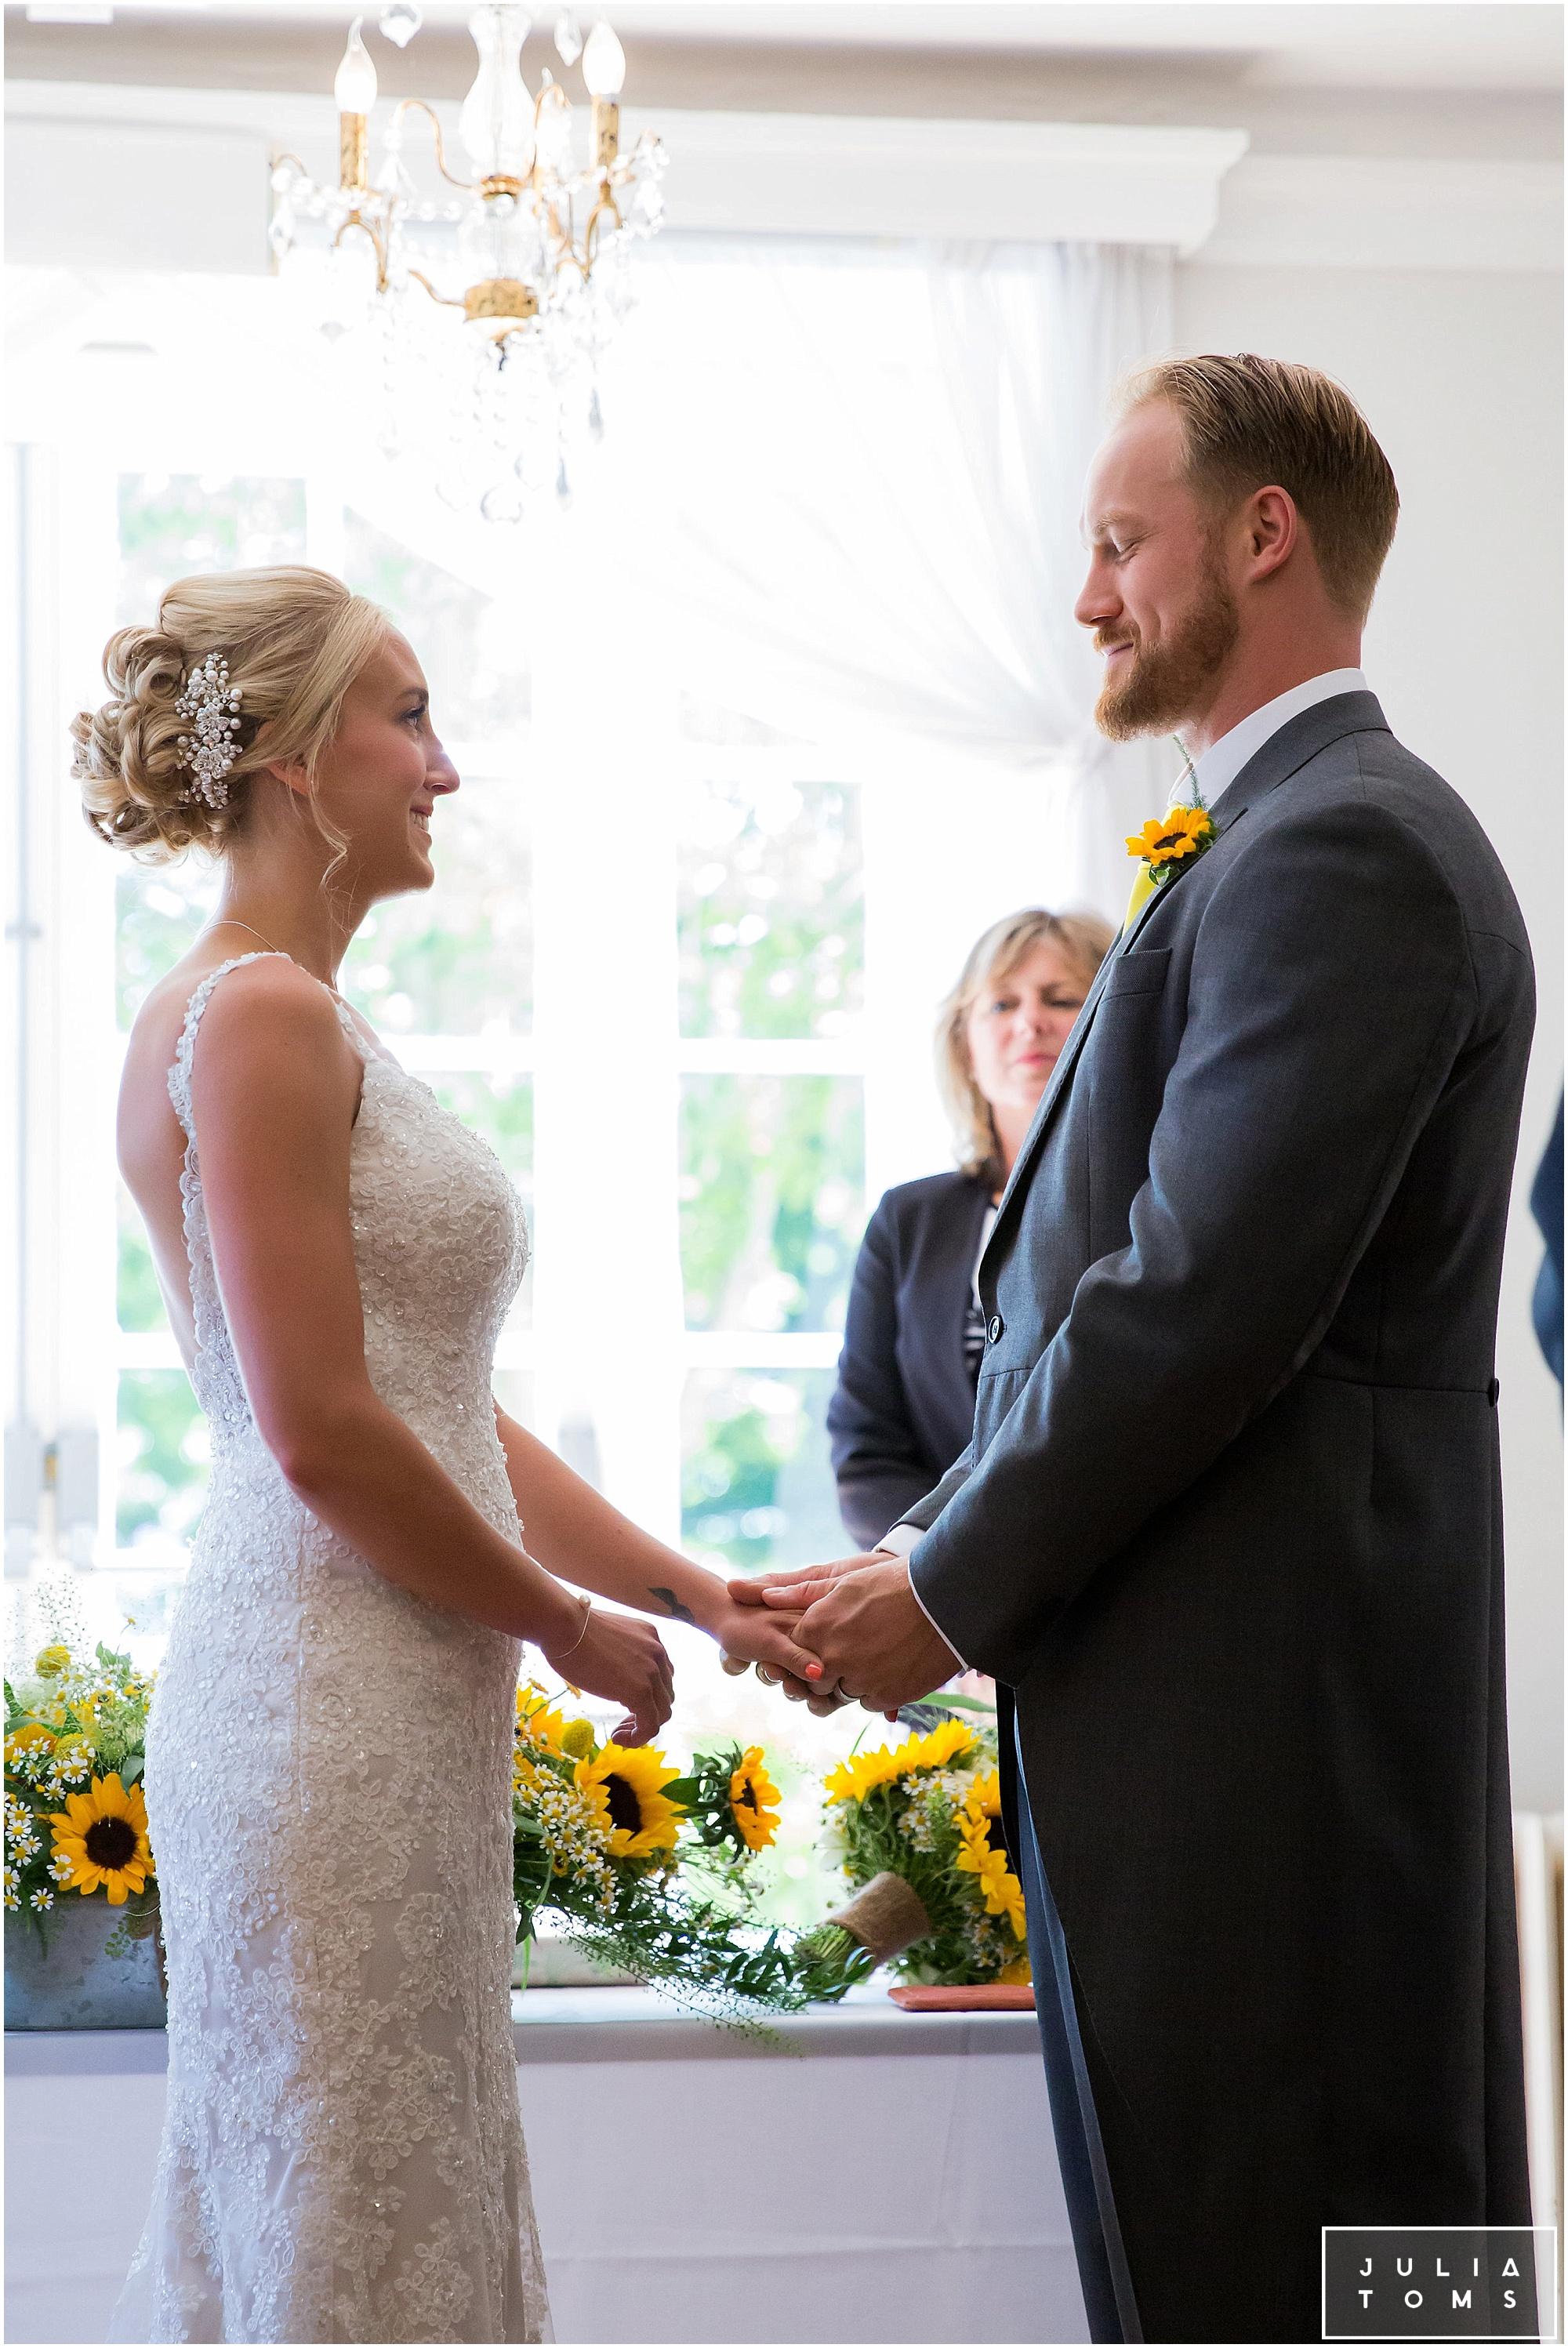 julia_toms_chichester_wedding_photographer_worthing_035.jpg